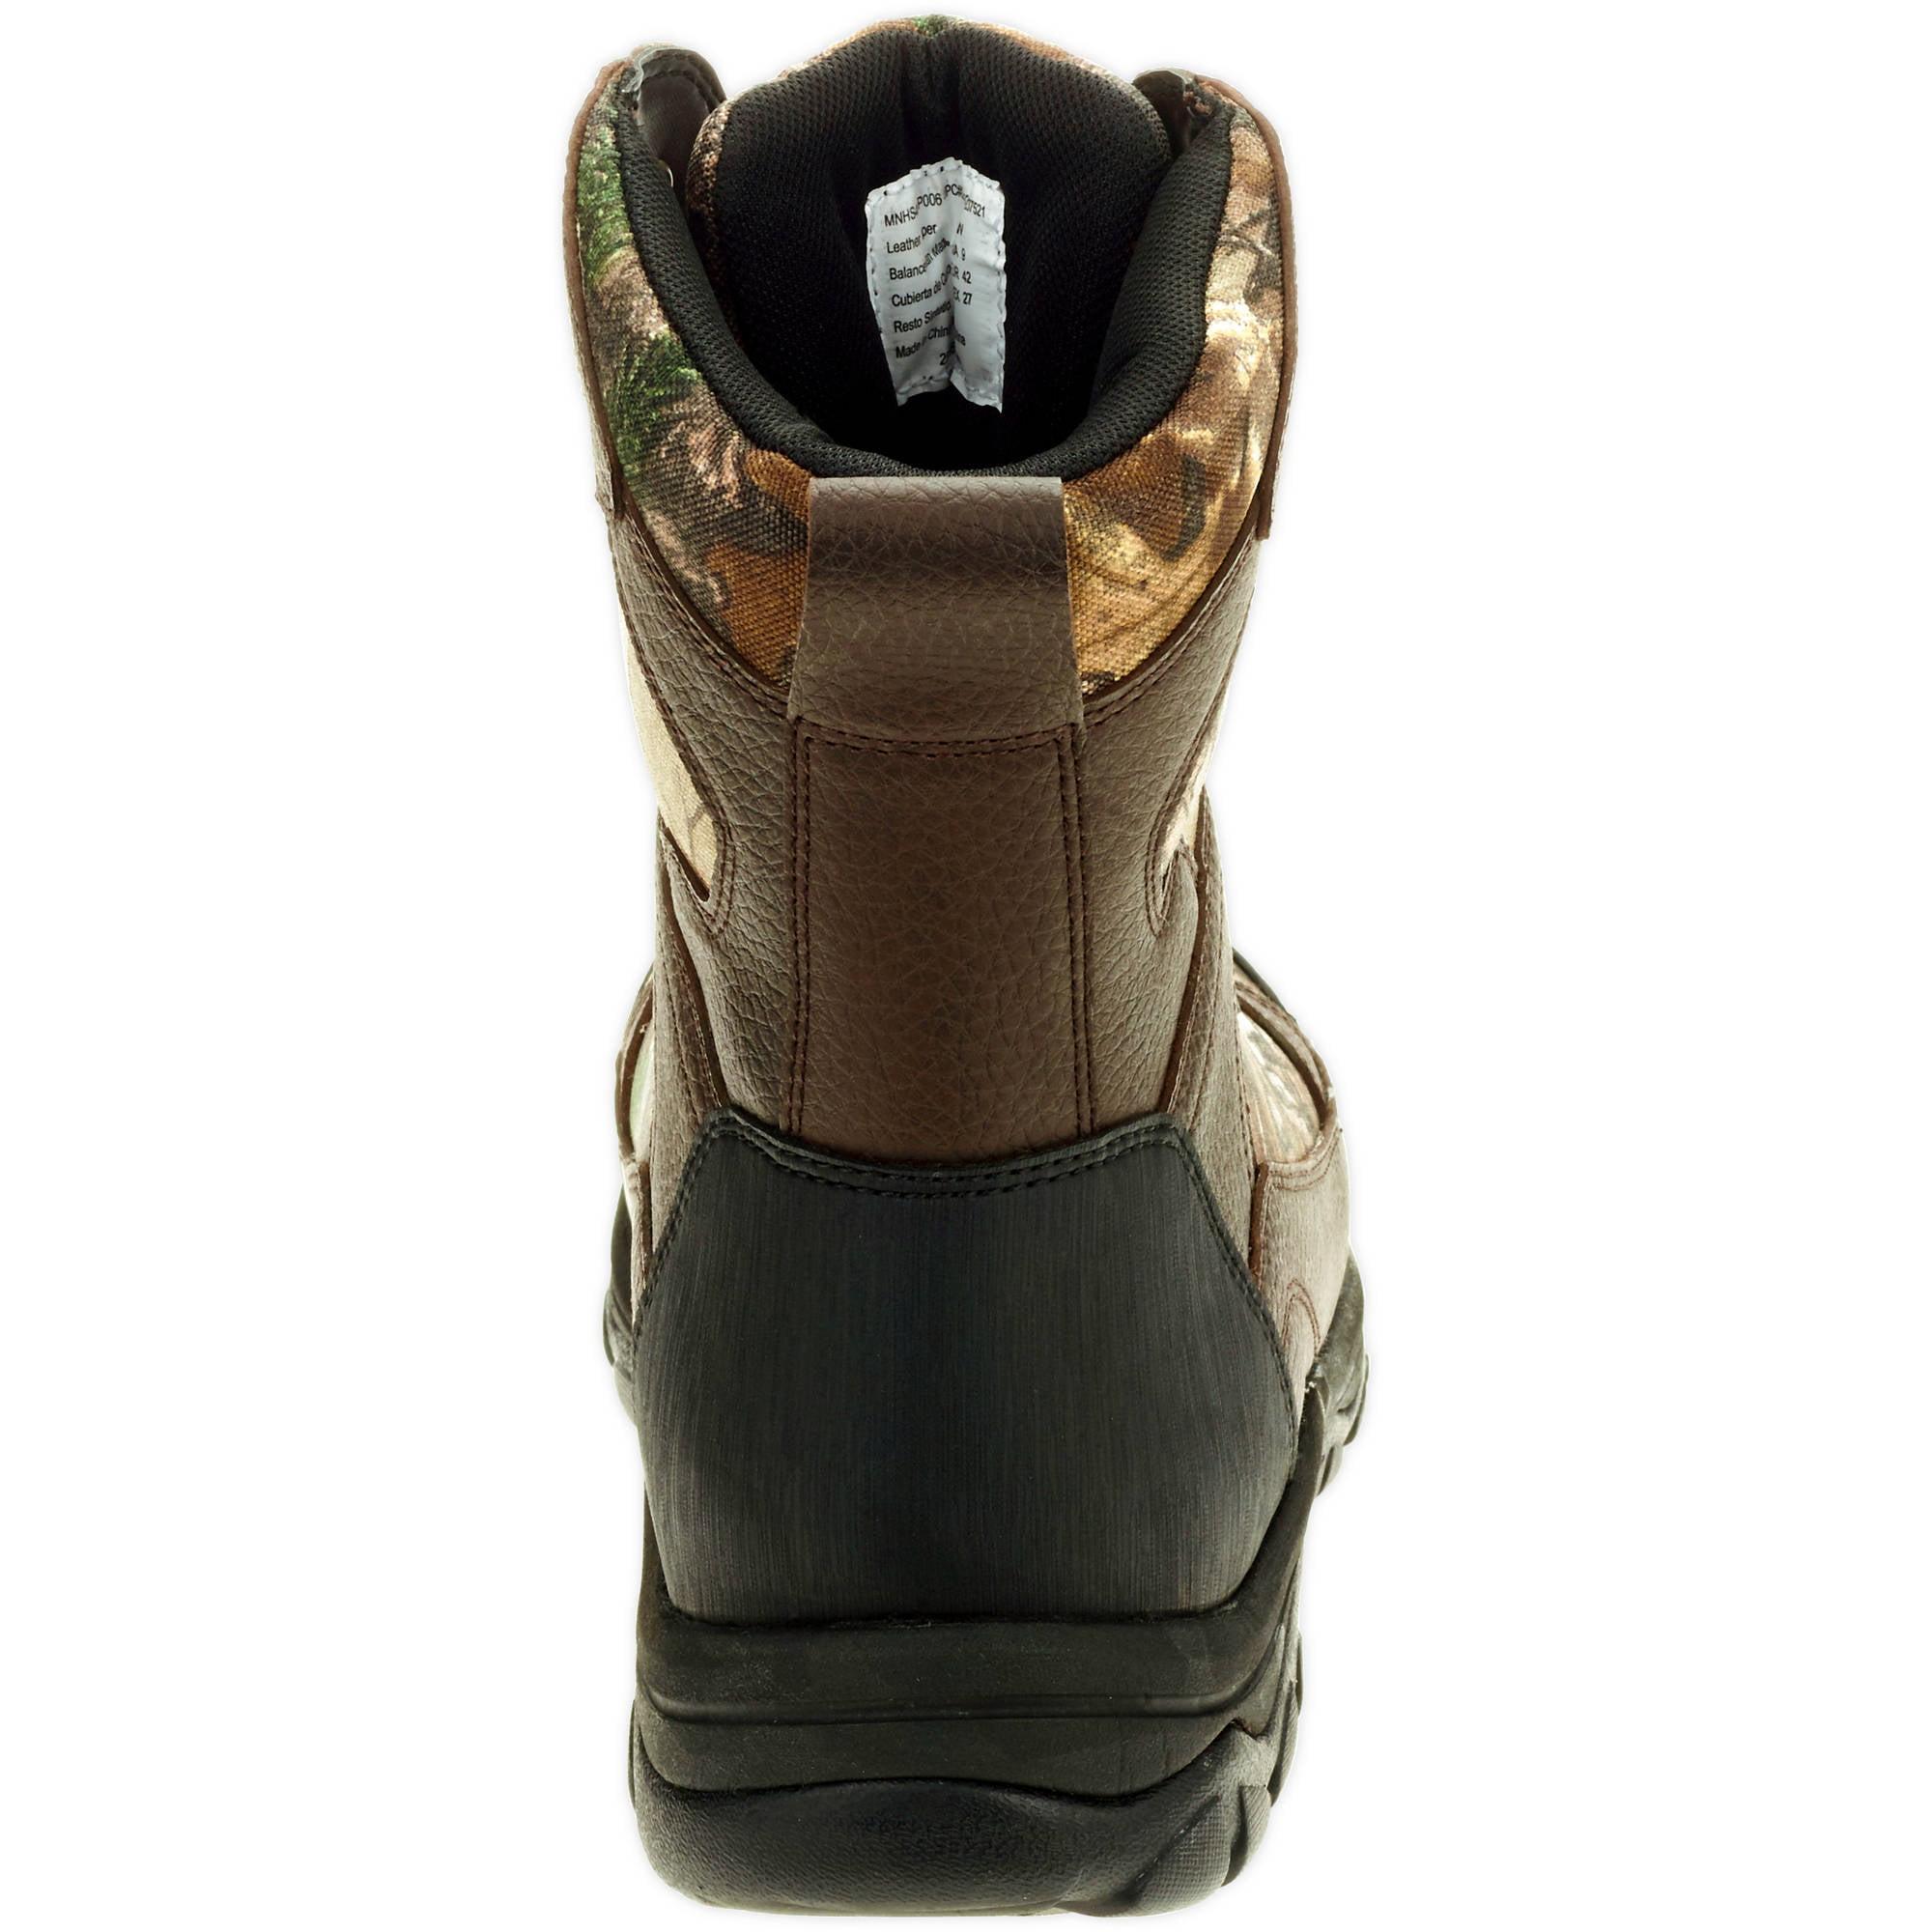 "Herman Surviviors Men's 8"" Camo Hunting Boot"